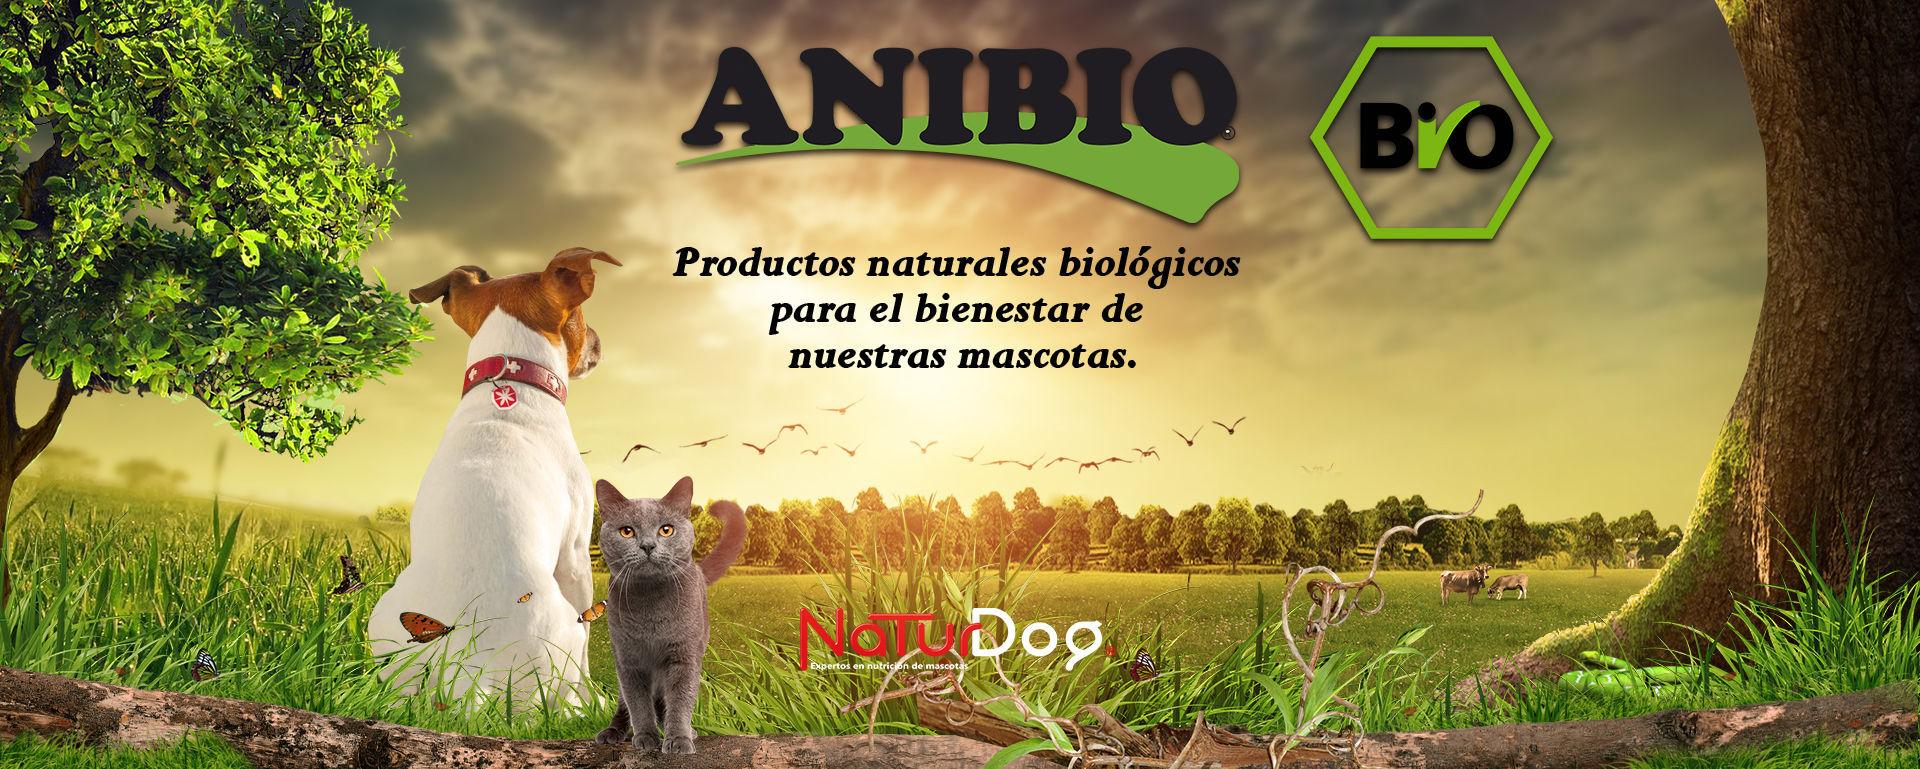 Evoque nueva gama alimentacion perros gatos Visan NaturDog